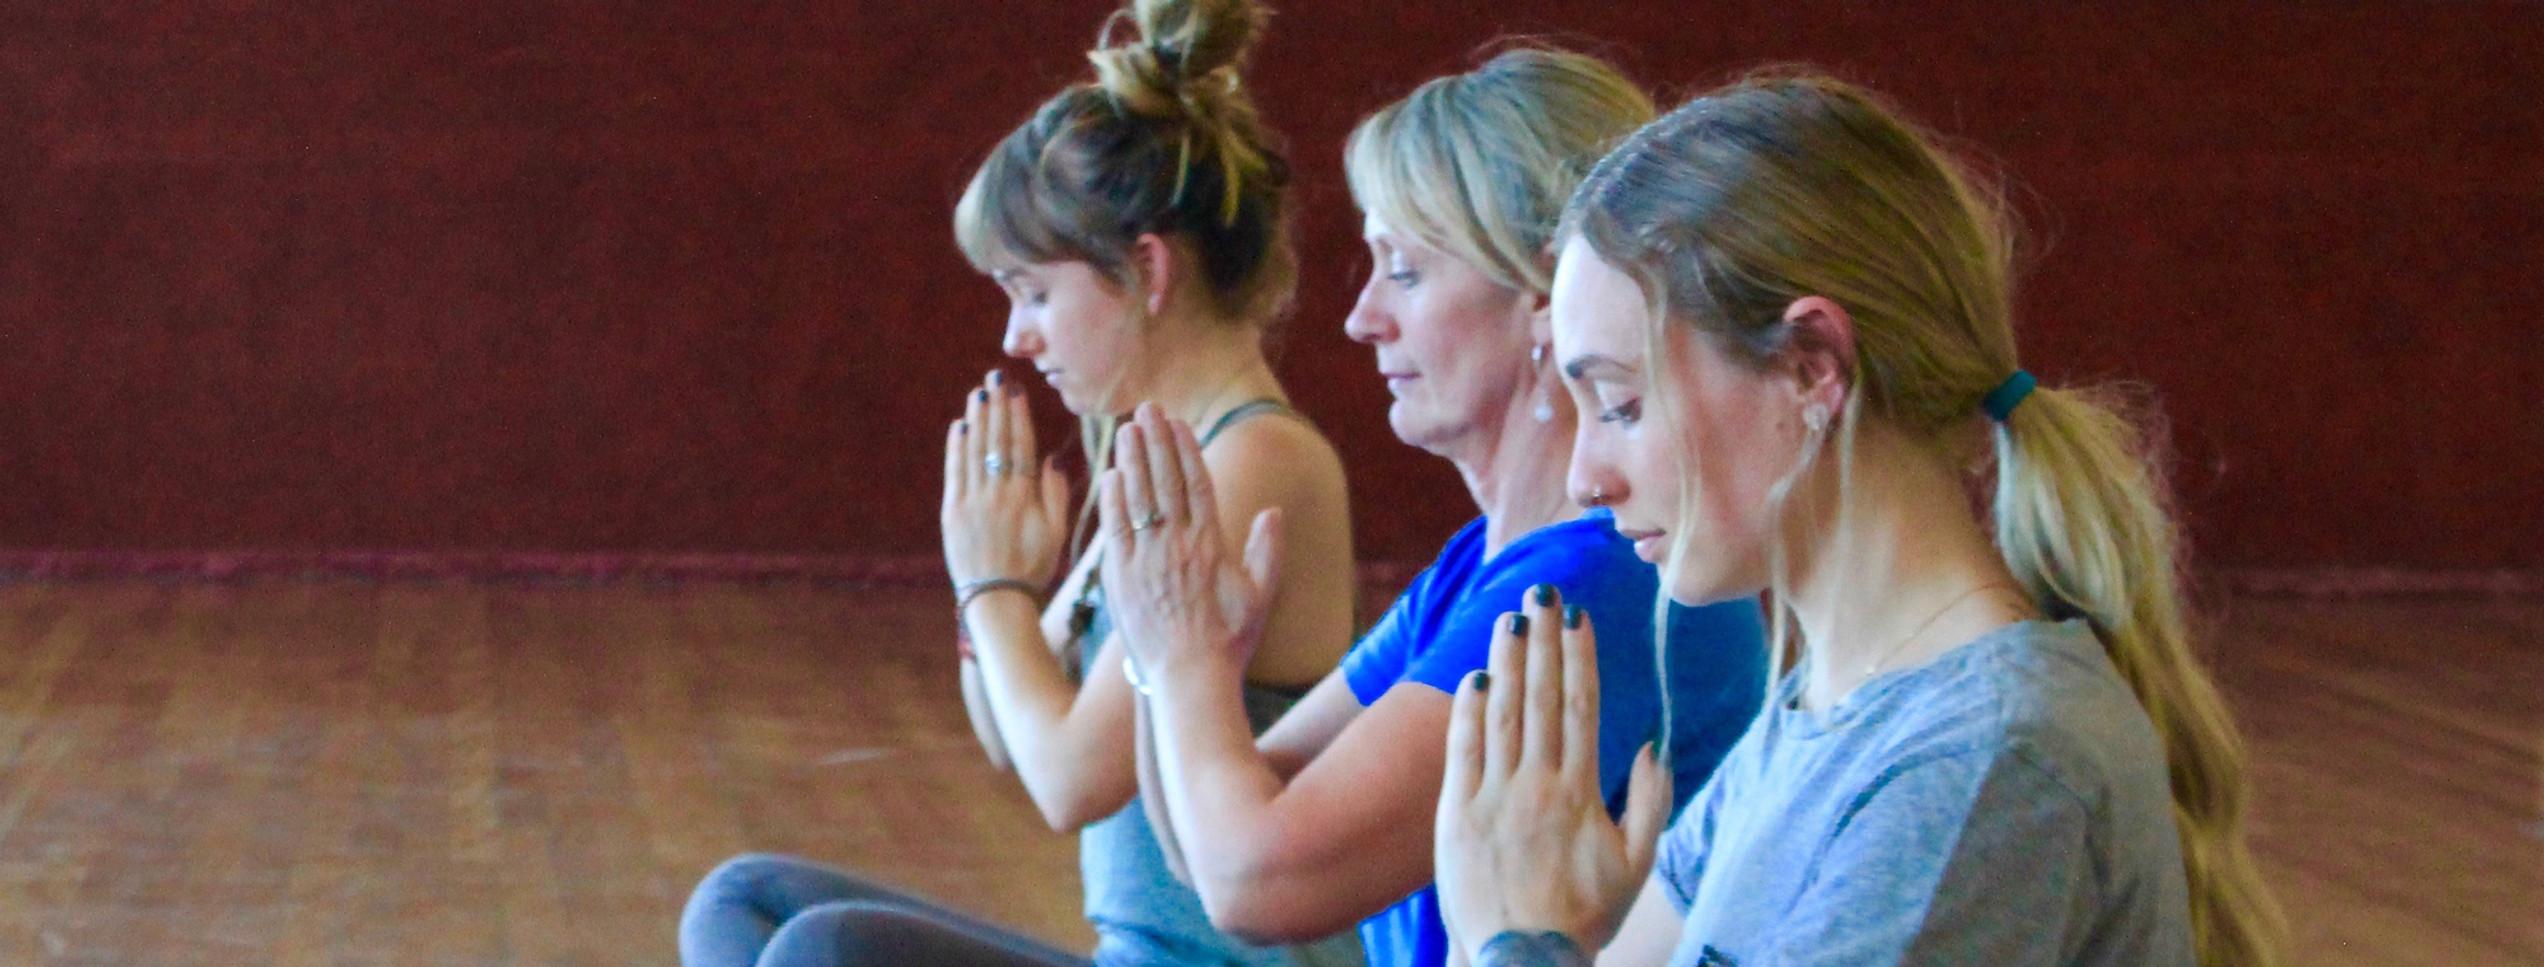 yoga class tuggeranong yogapathways